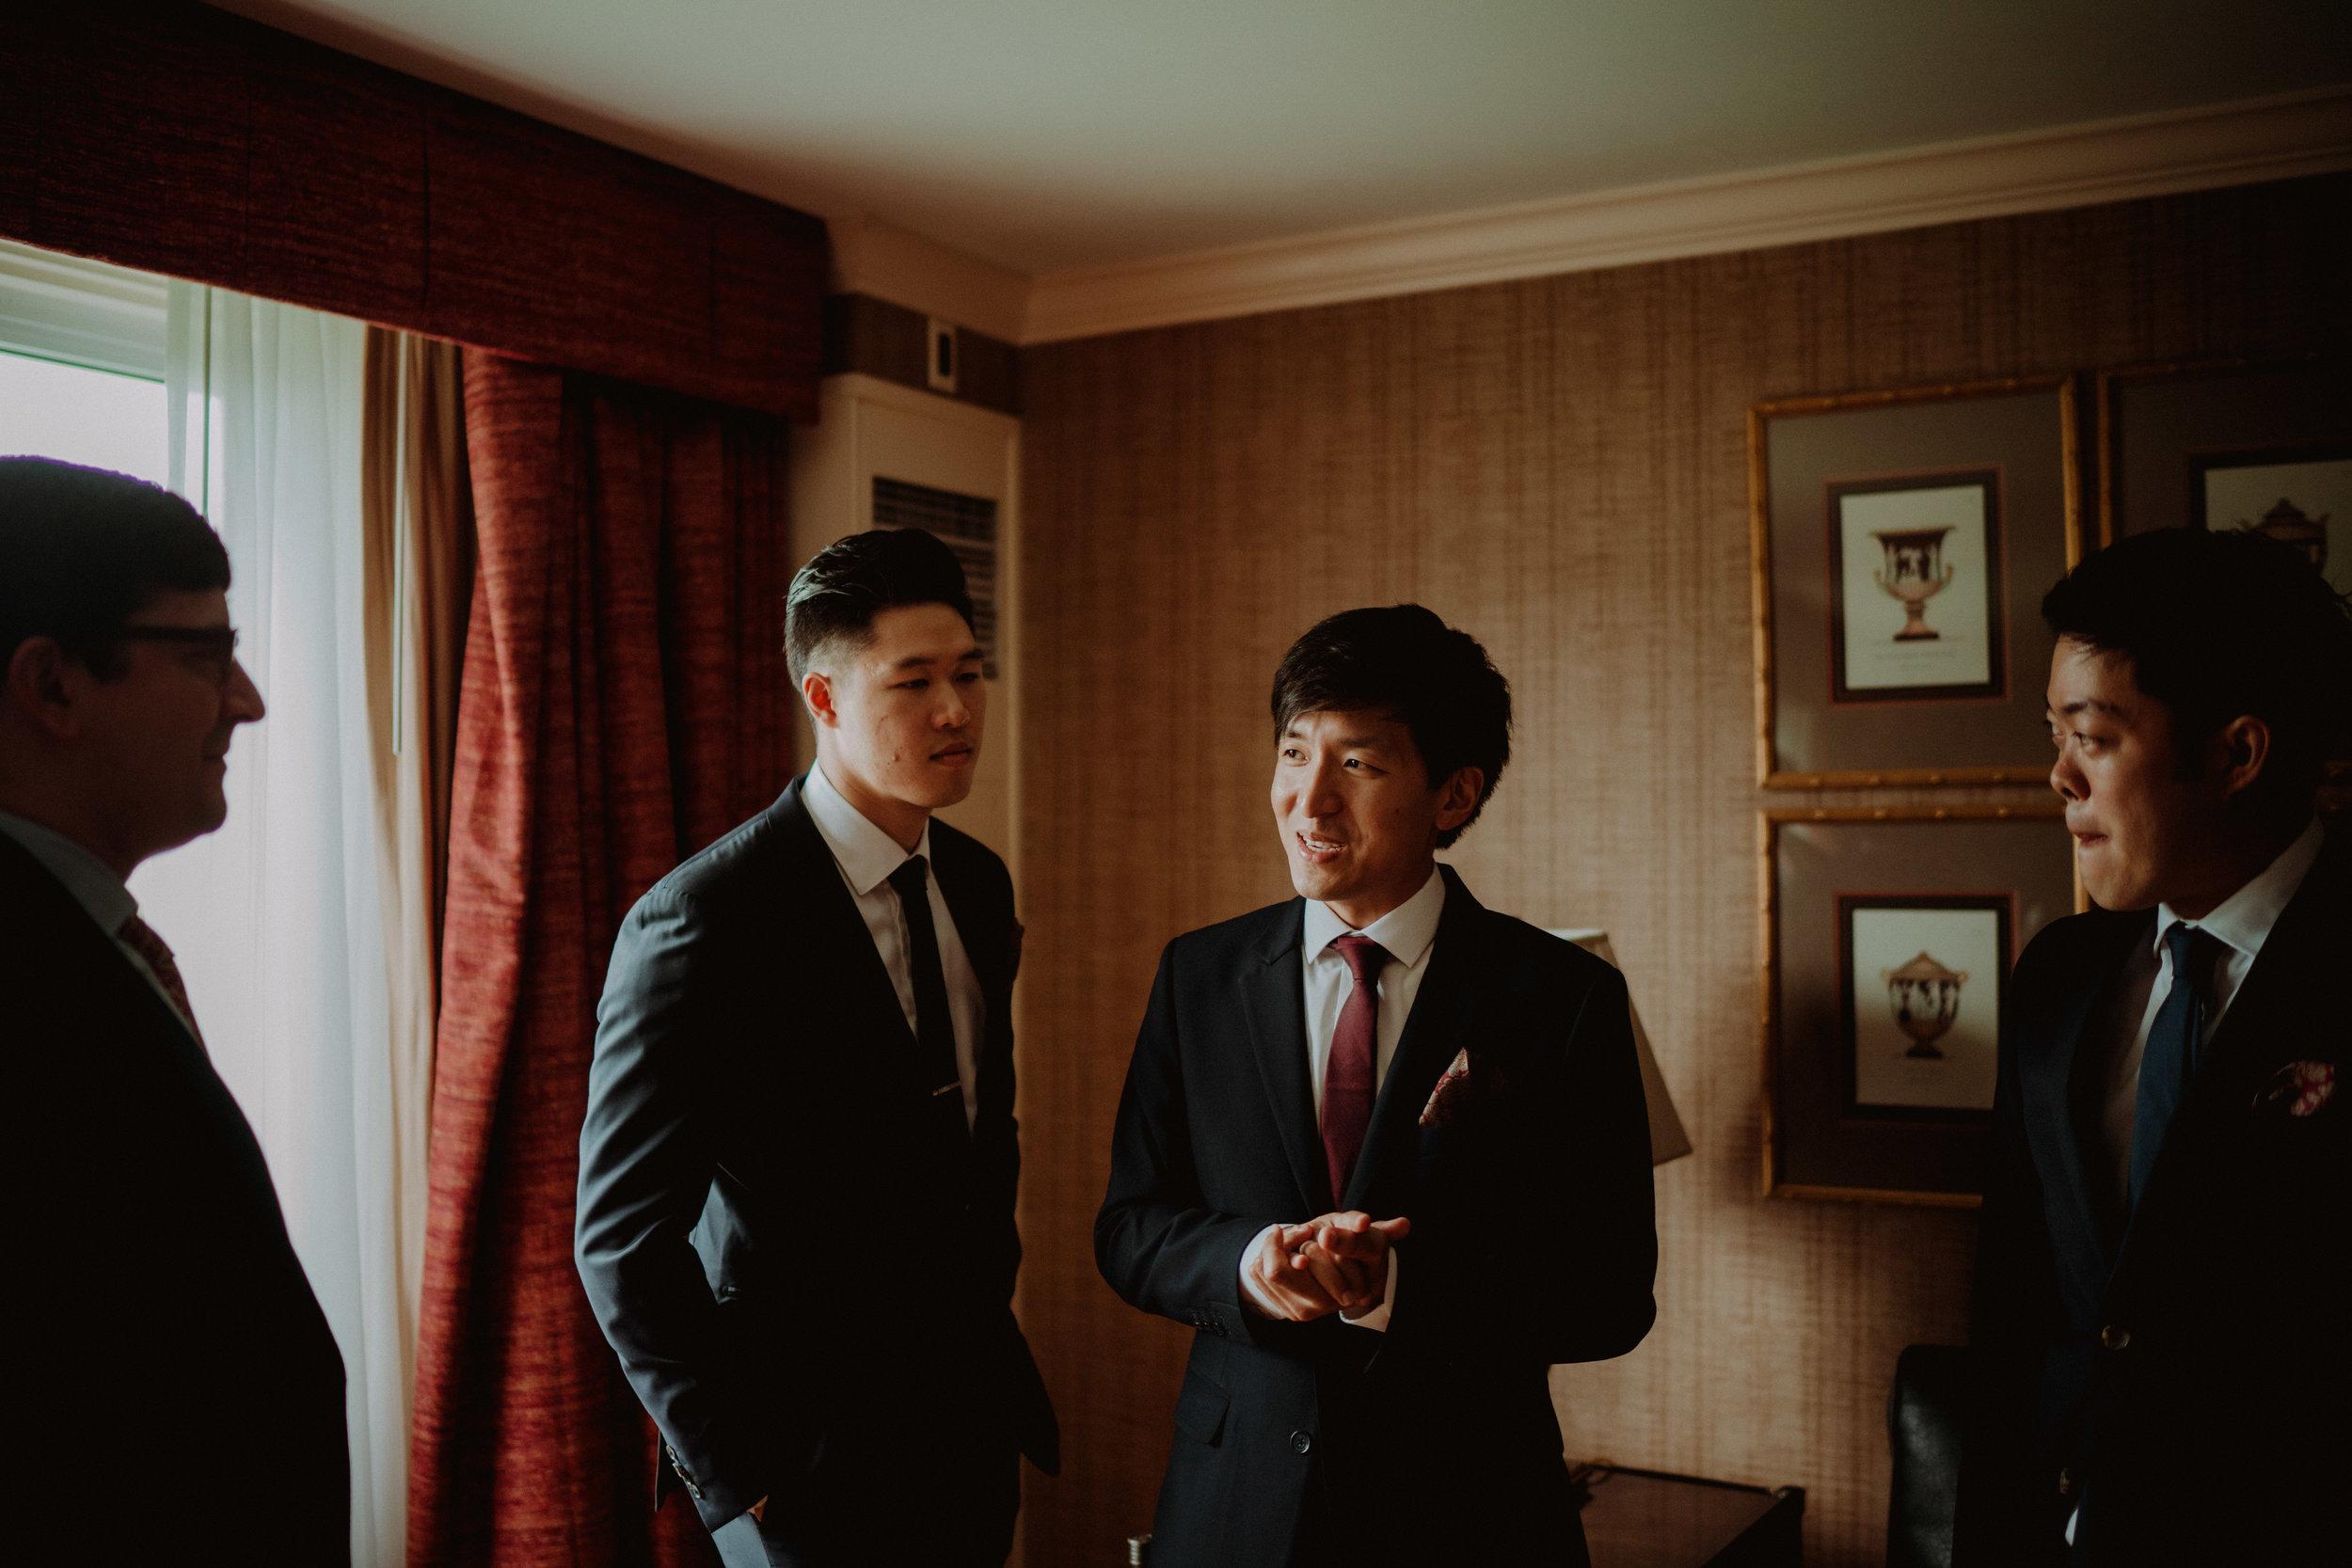 Irene-and-Jae-2019_Brooklyn_Wedding_Photographer_Chellise_Michael_Photography--14.jpg